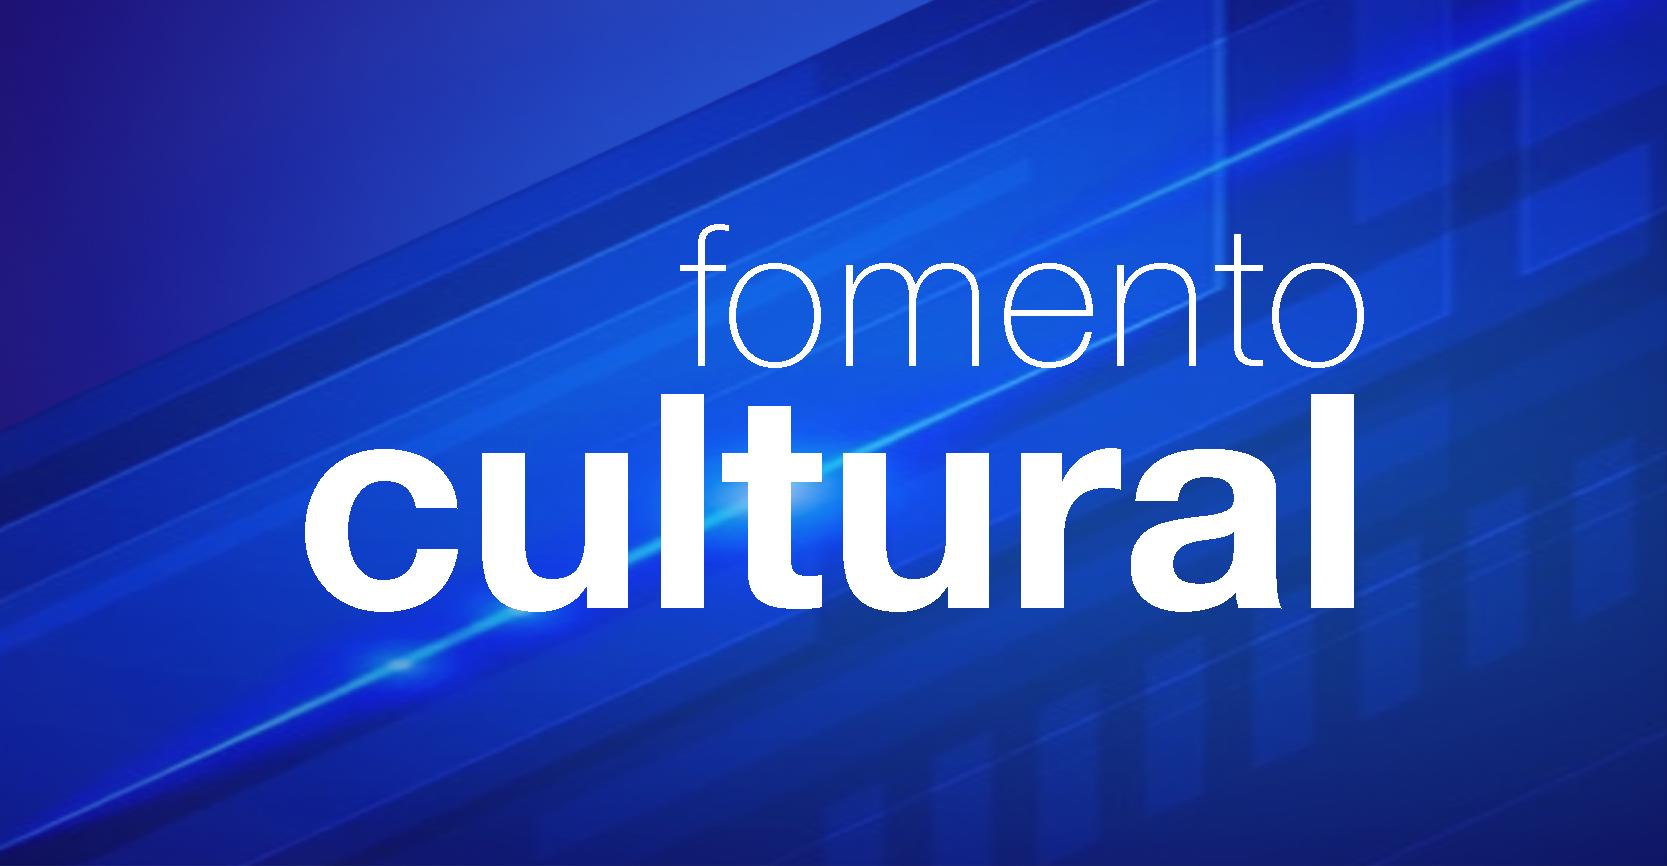 Prepa CUAM Fomento cultural